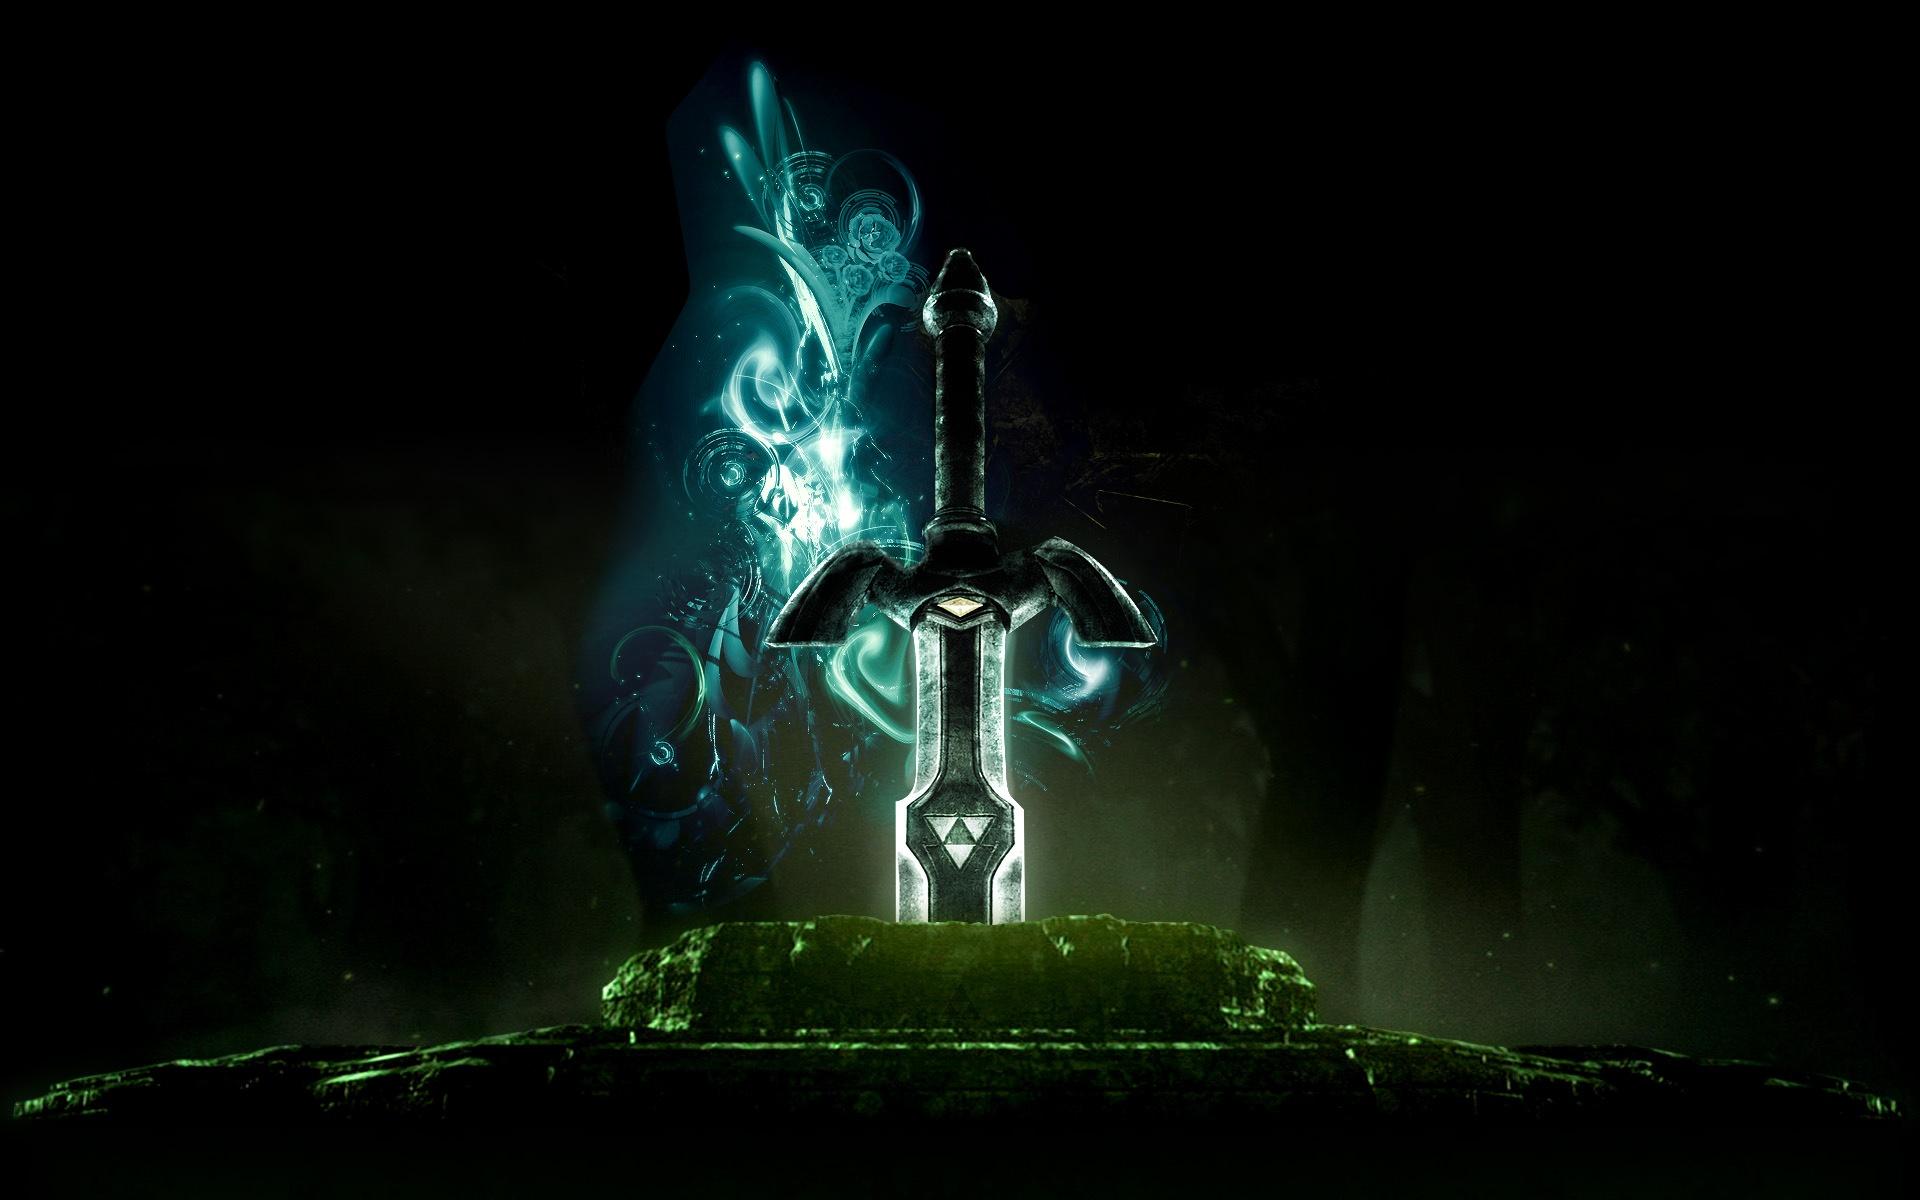 Alienware Desktop Background The Legend Of Zelda Ocarina Of Time The Master Sword 1920x1200